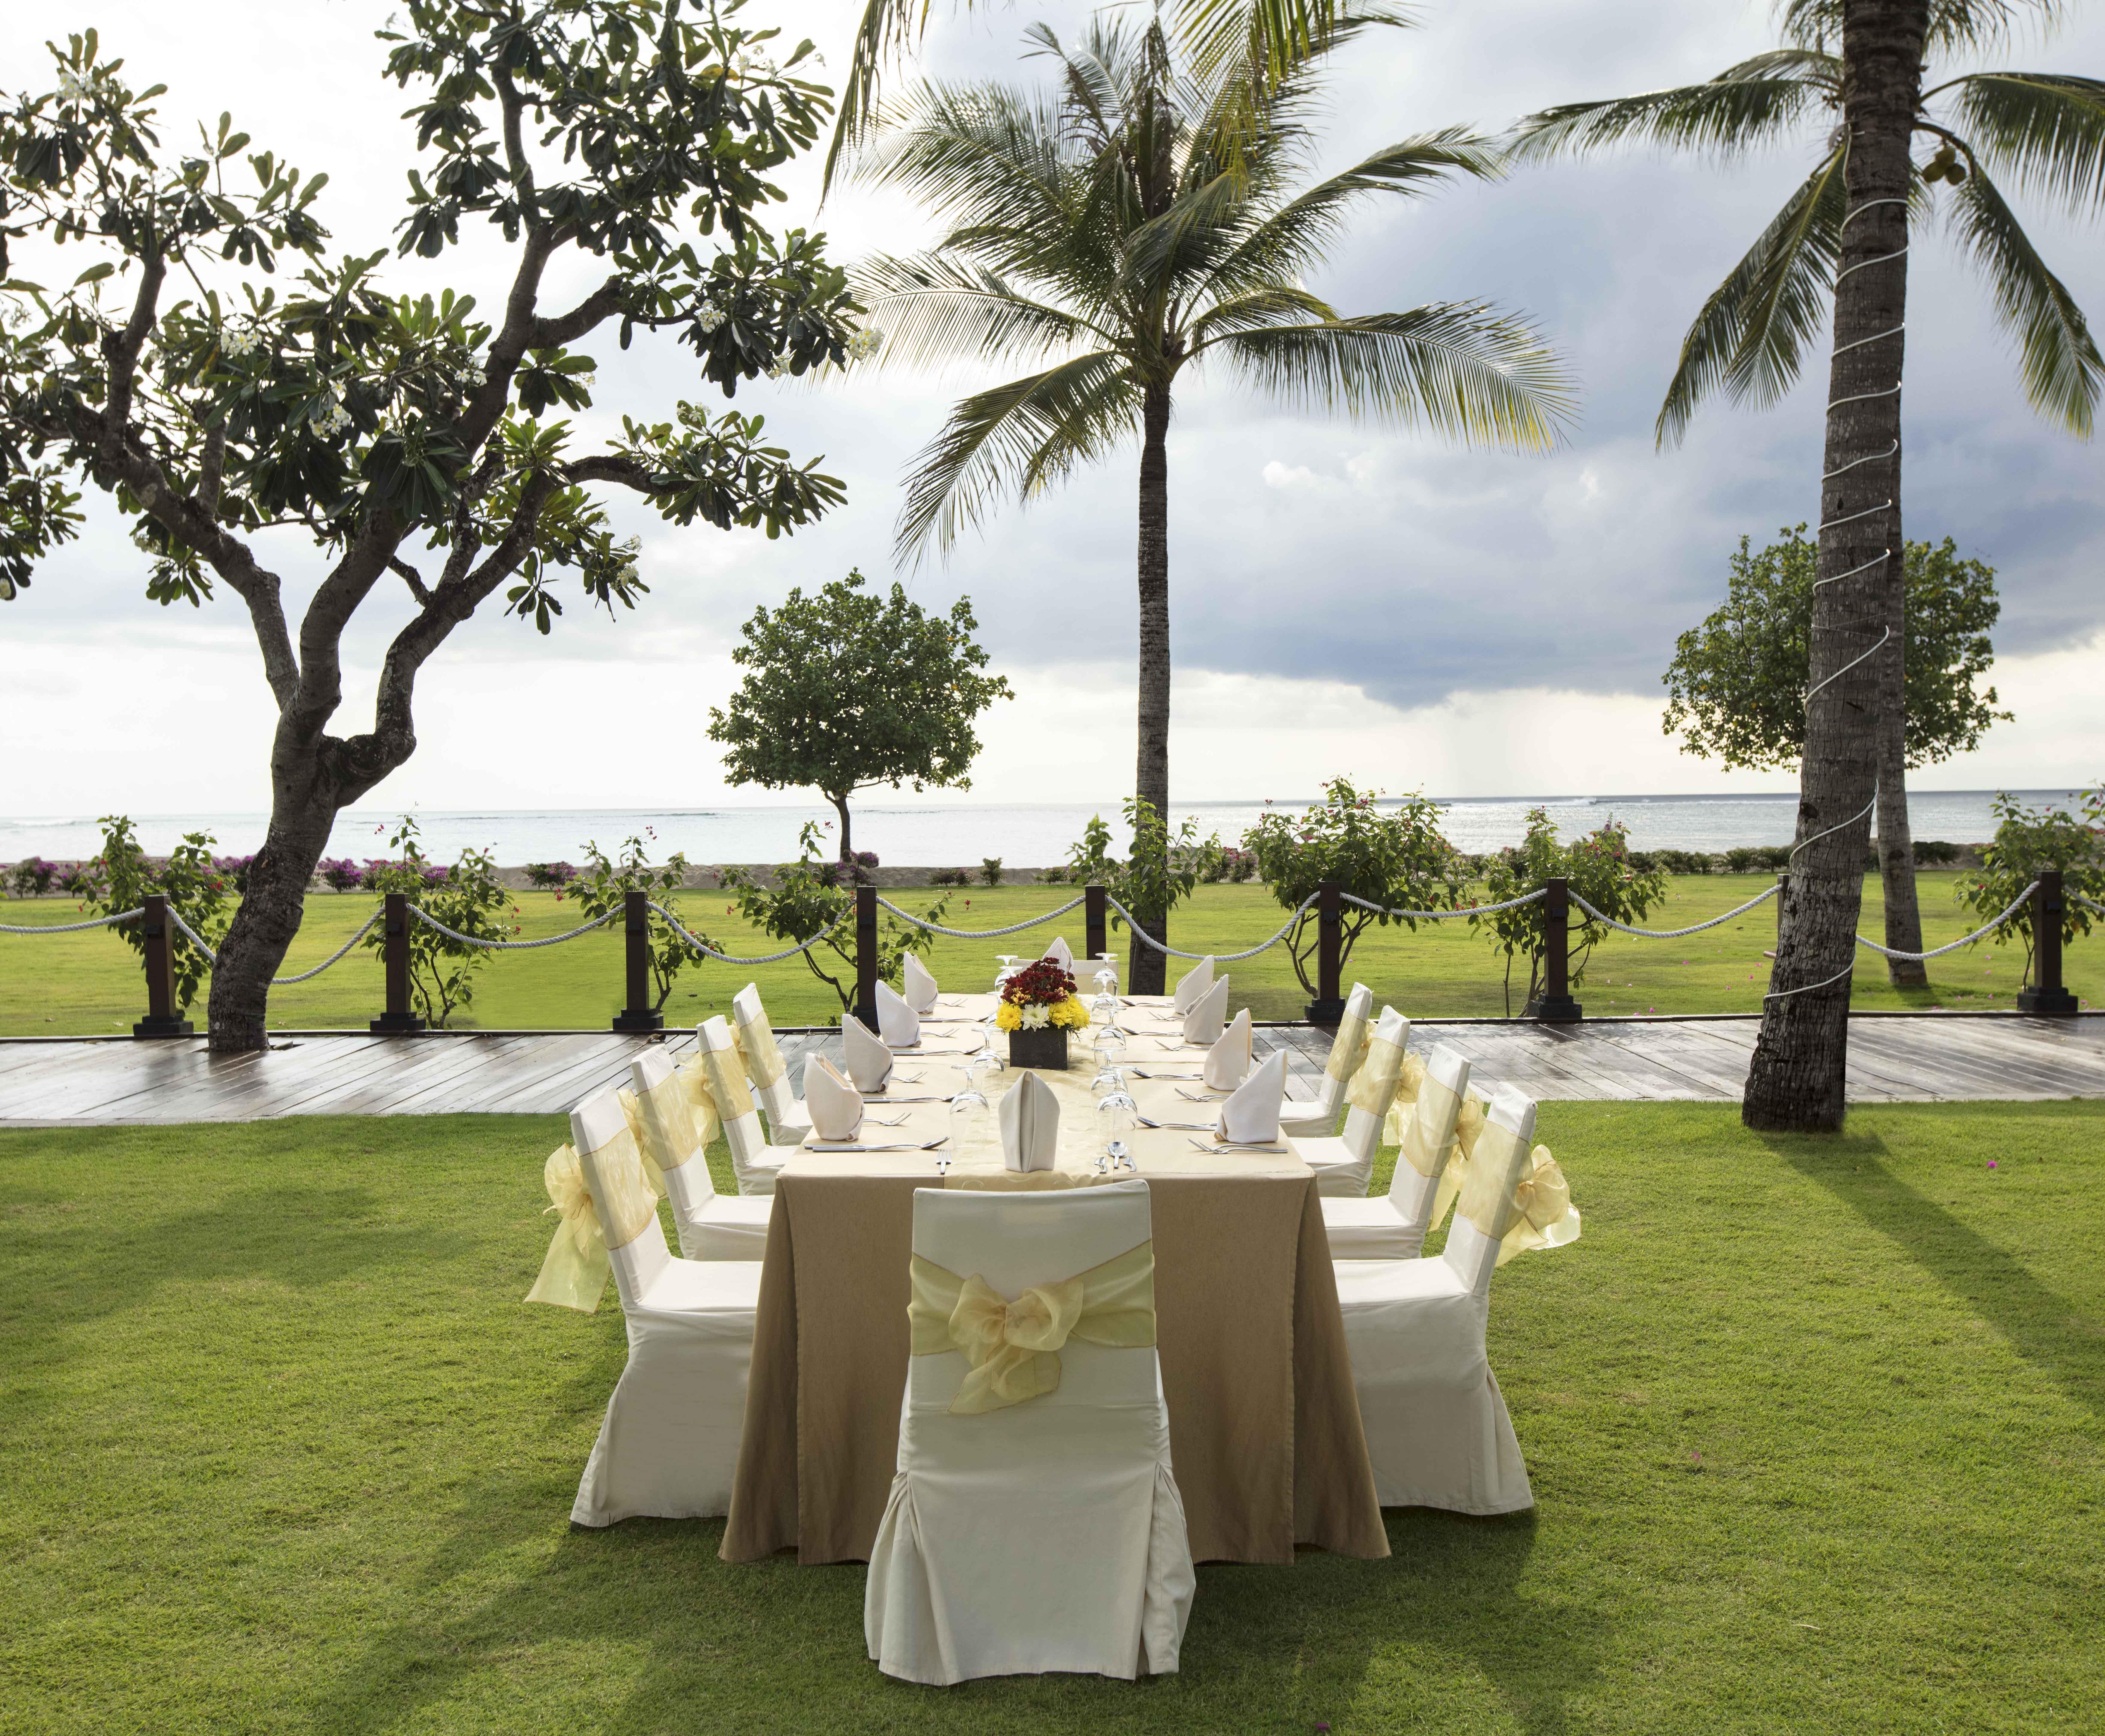 Weddings at Baruna Bali - Garden & Beach by Holiday Inn Resort ...